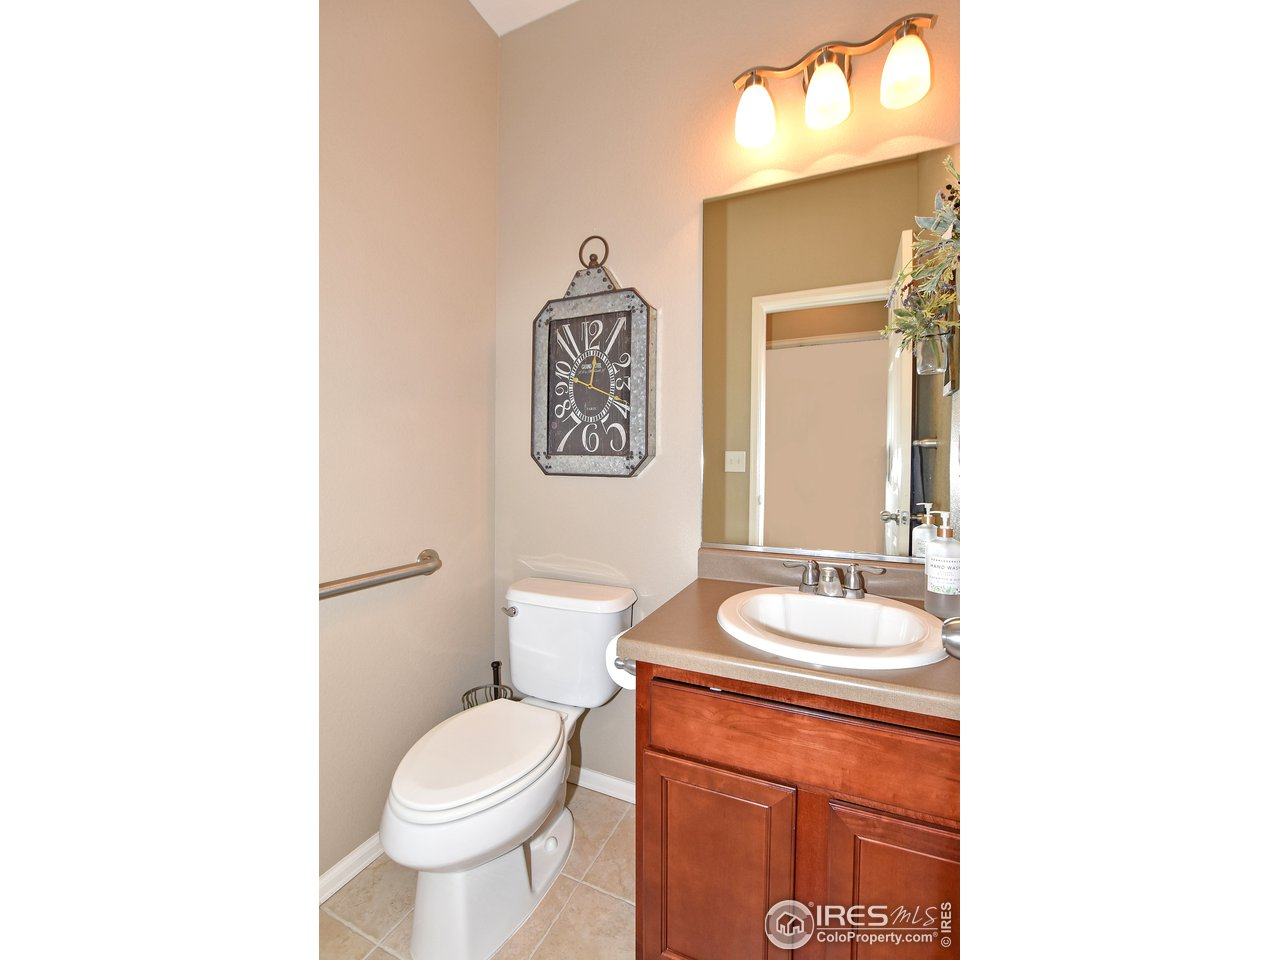 1/2 bathroom off laundry room